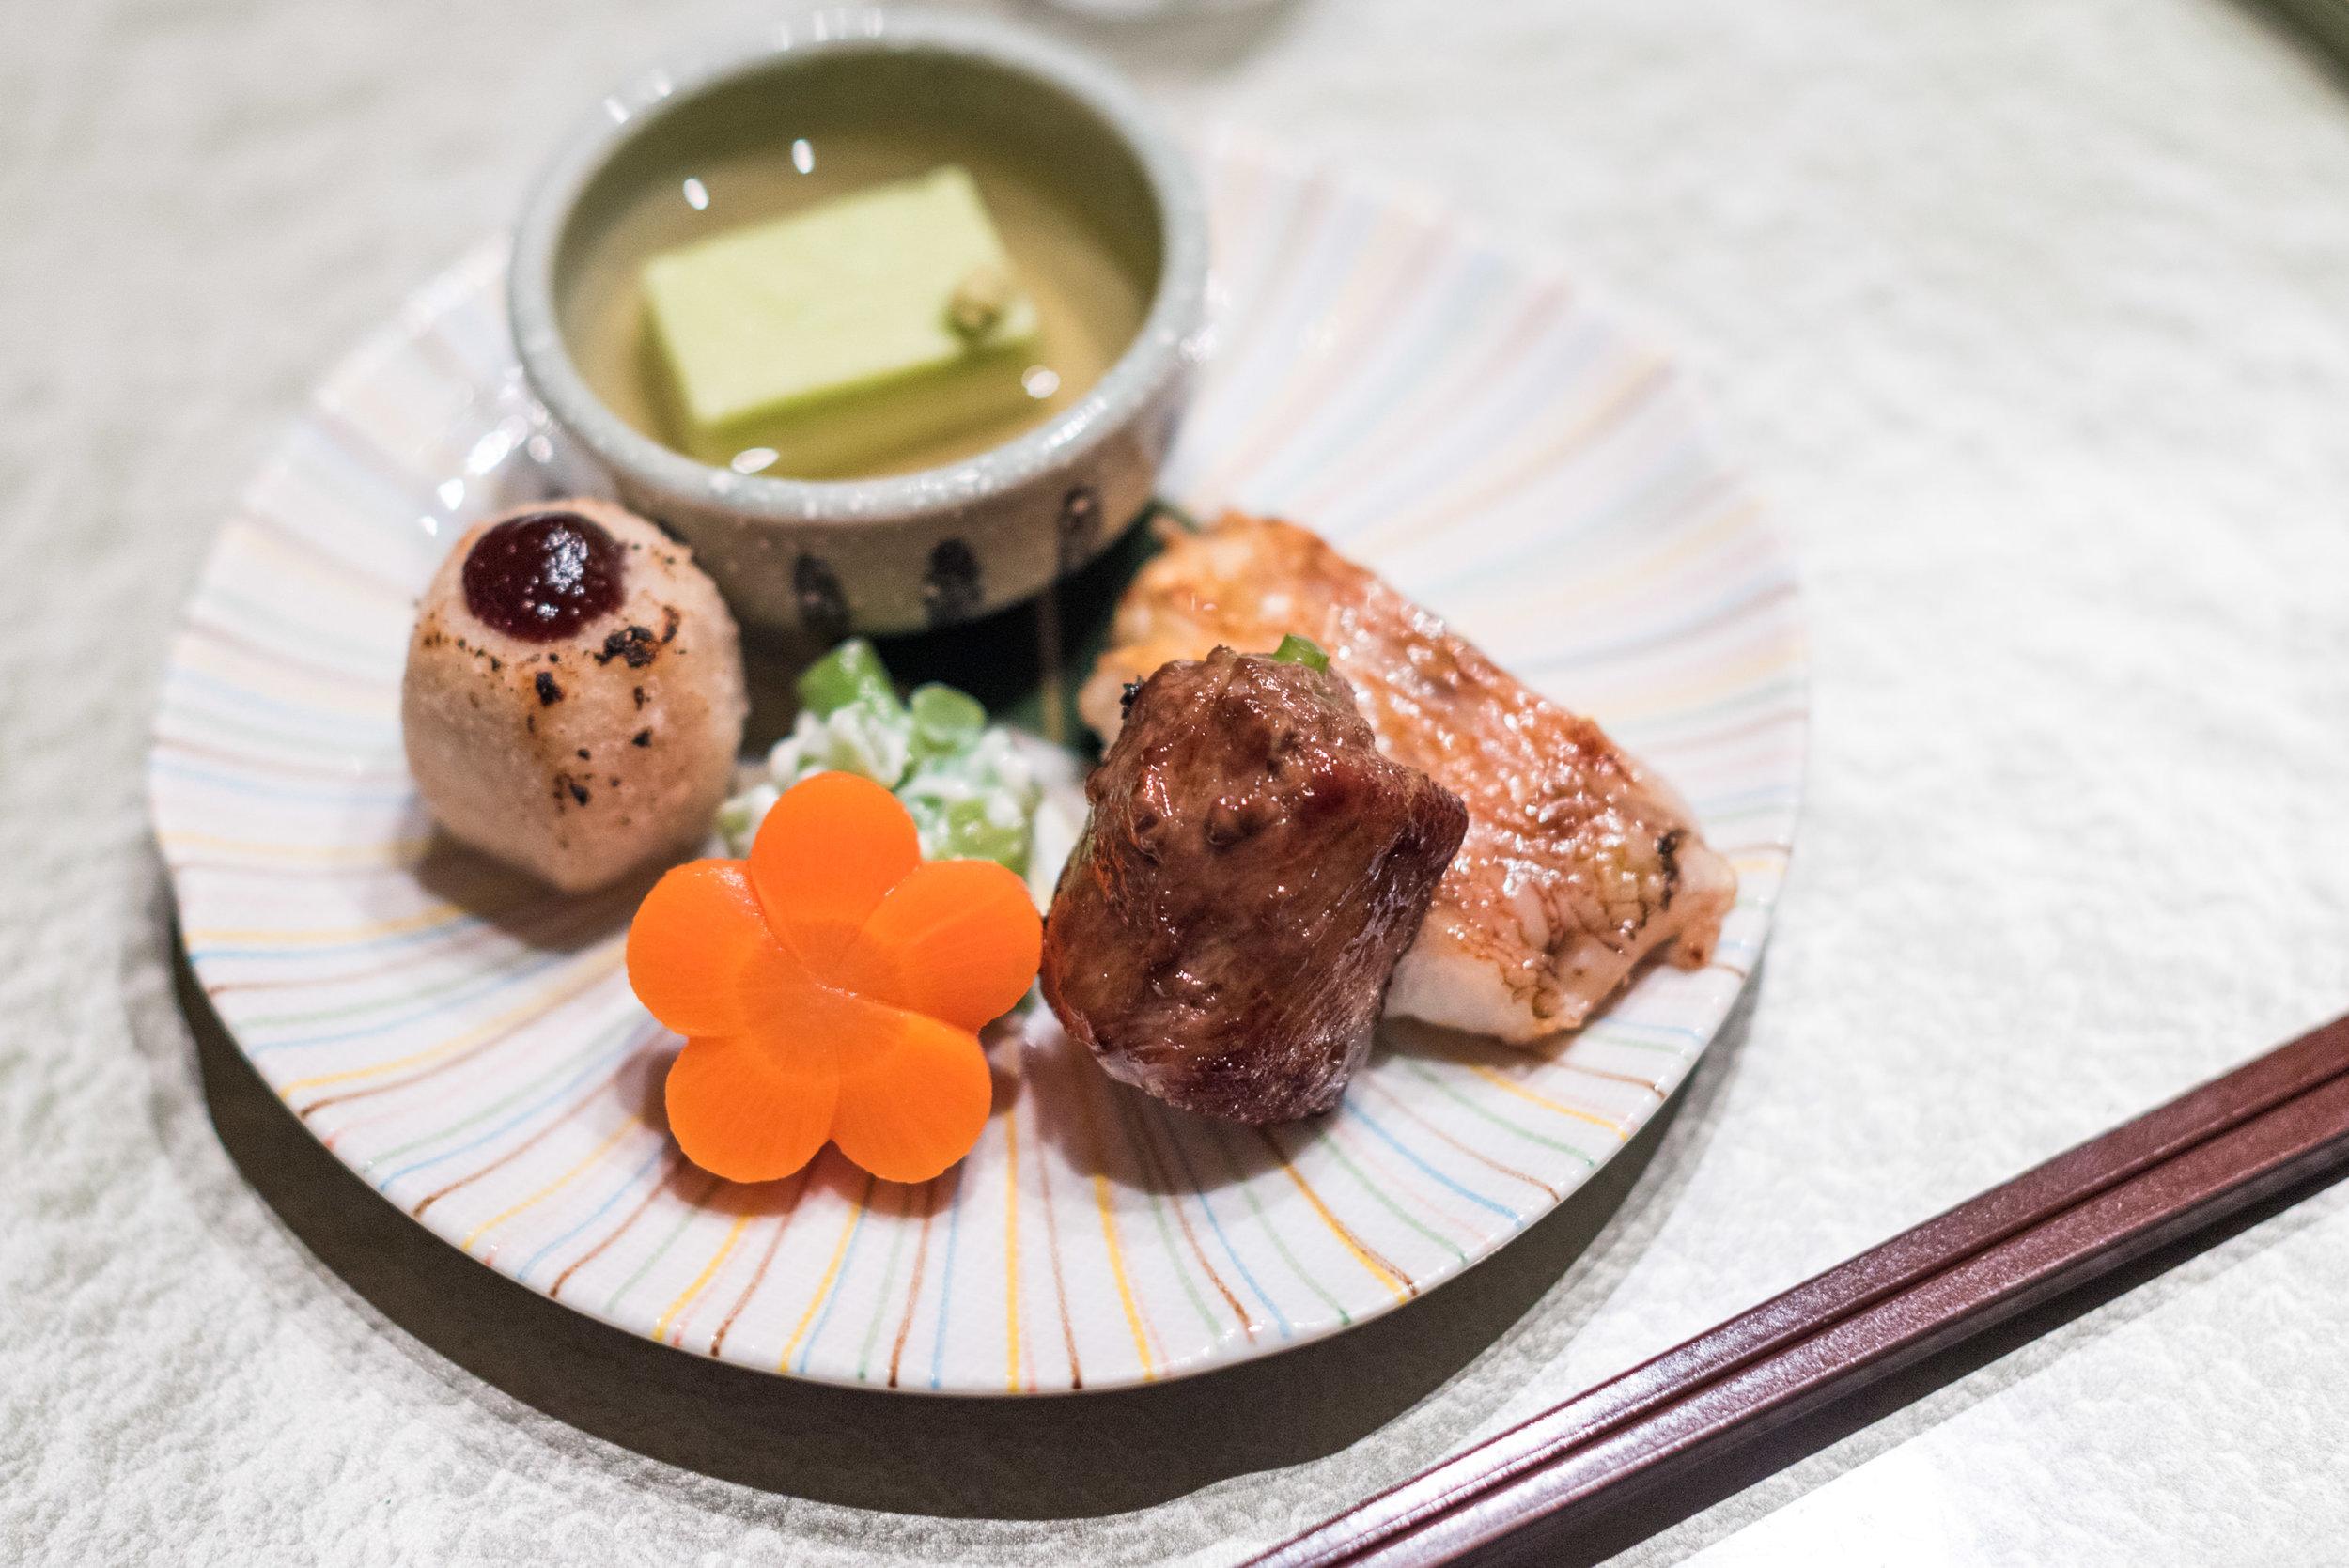 Chef Kudo's Seasonal Inspiration - Grilled Amadai, Poached Asparagus rolled with U.S. Beef, Taro with Miso, Green Beans and Handmade Green Pea Tofu  ibuki by Takagi Kazuo - Shangri-La's Far Eastern Plaza Hotel, Taipei